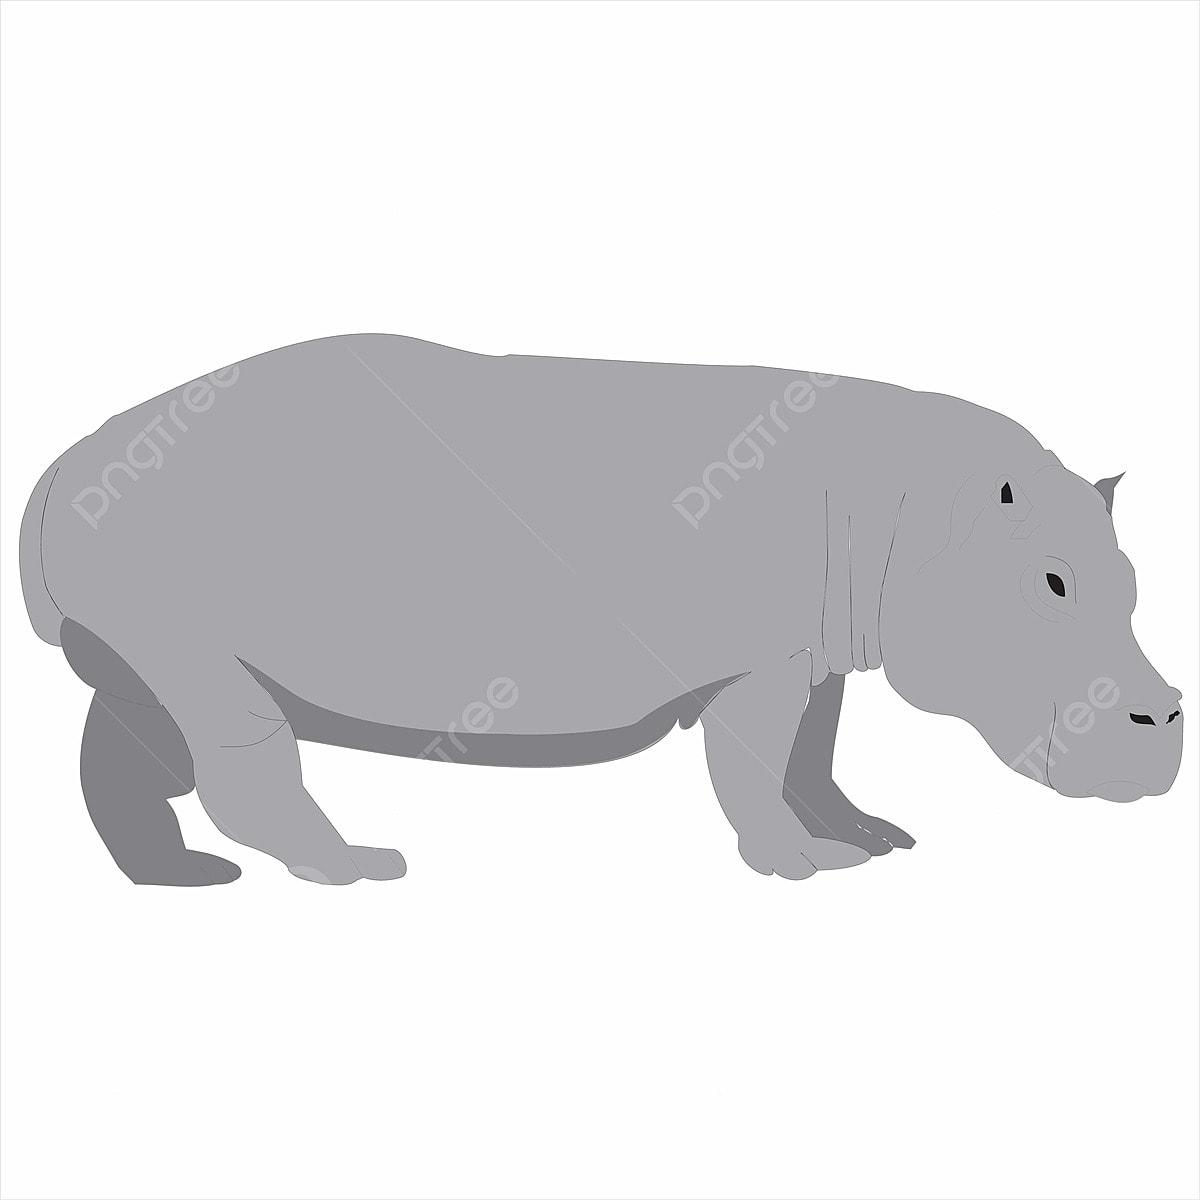 Cartoon Rhino Material Design, Rhinoceros, Comics, Murals